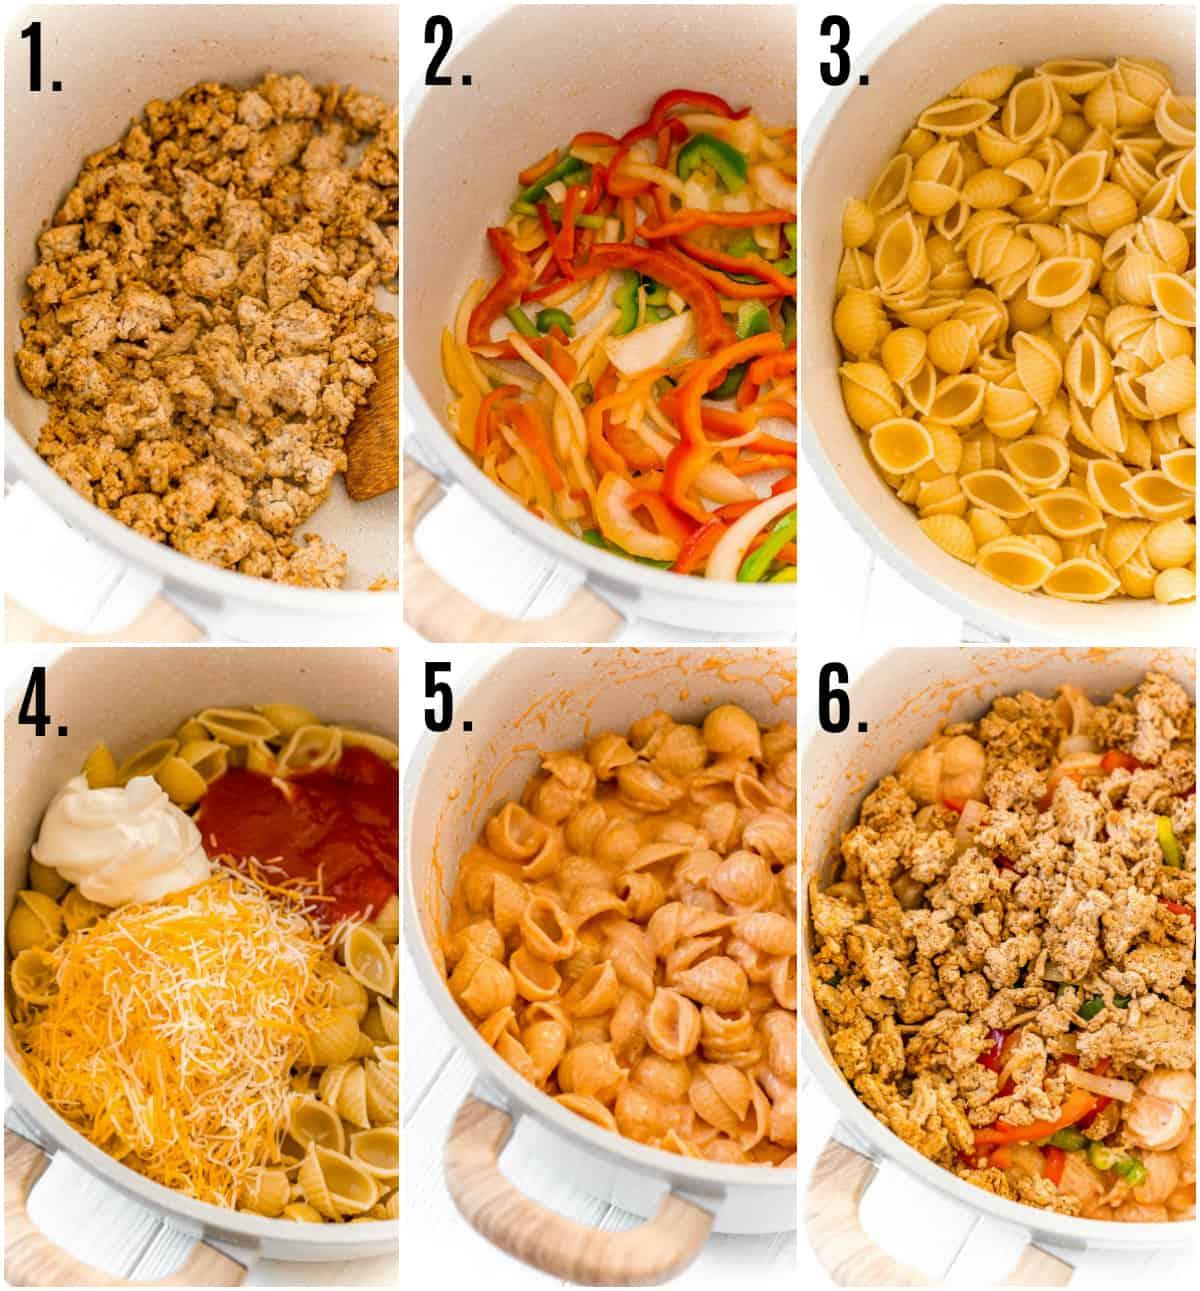 Step by step photos on how to make Chicken Fajita Pasta